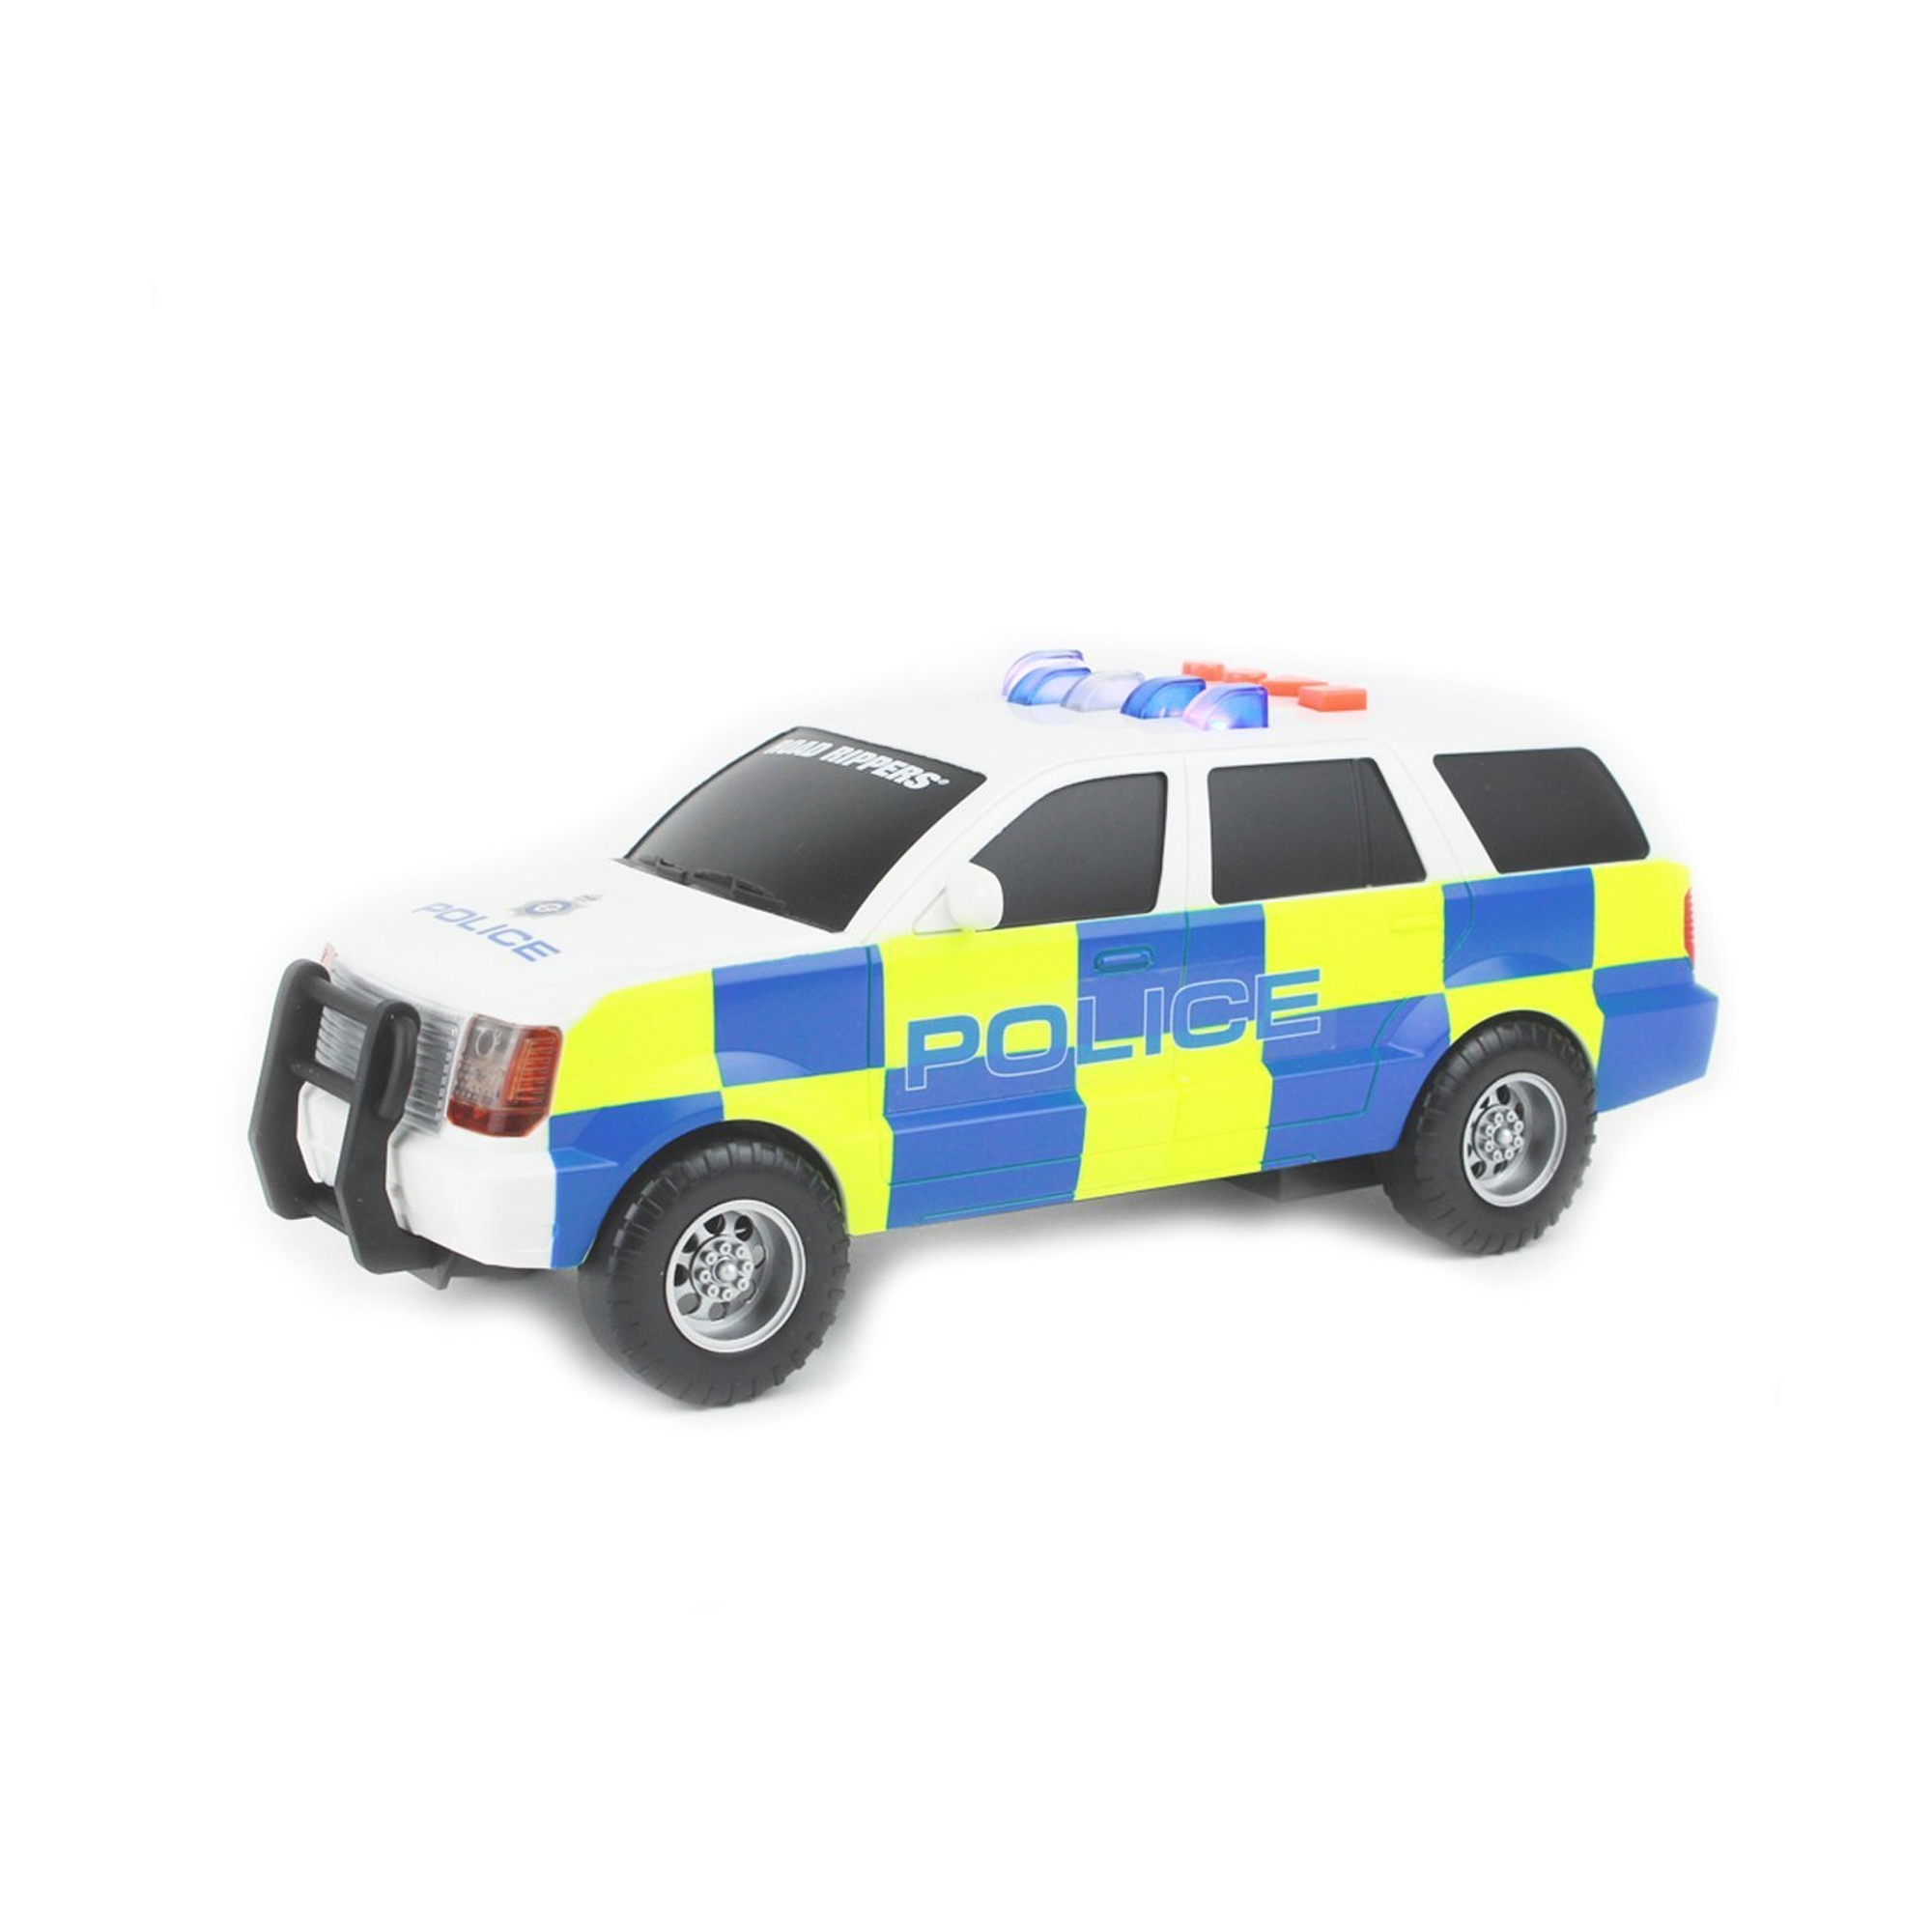 Motorised Police Car Toy - Large -